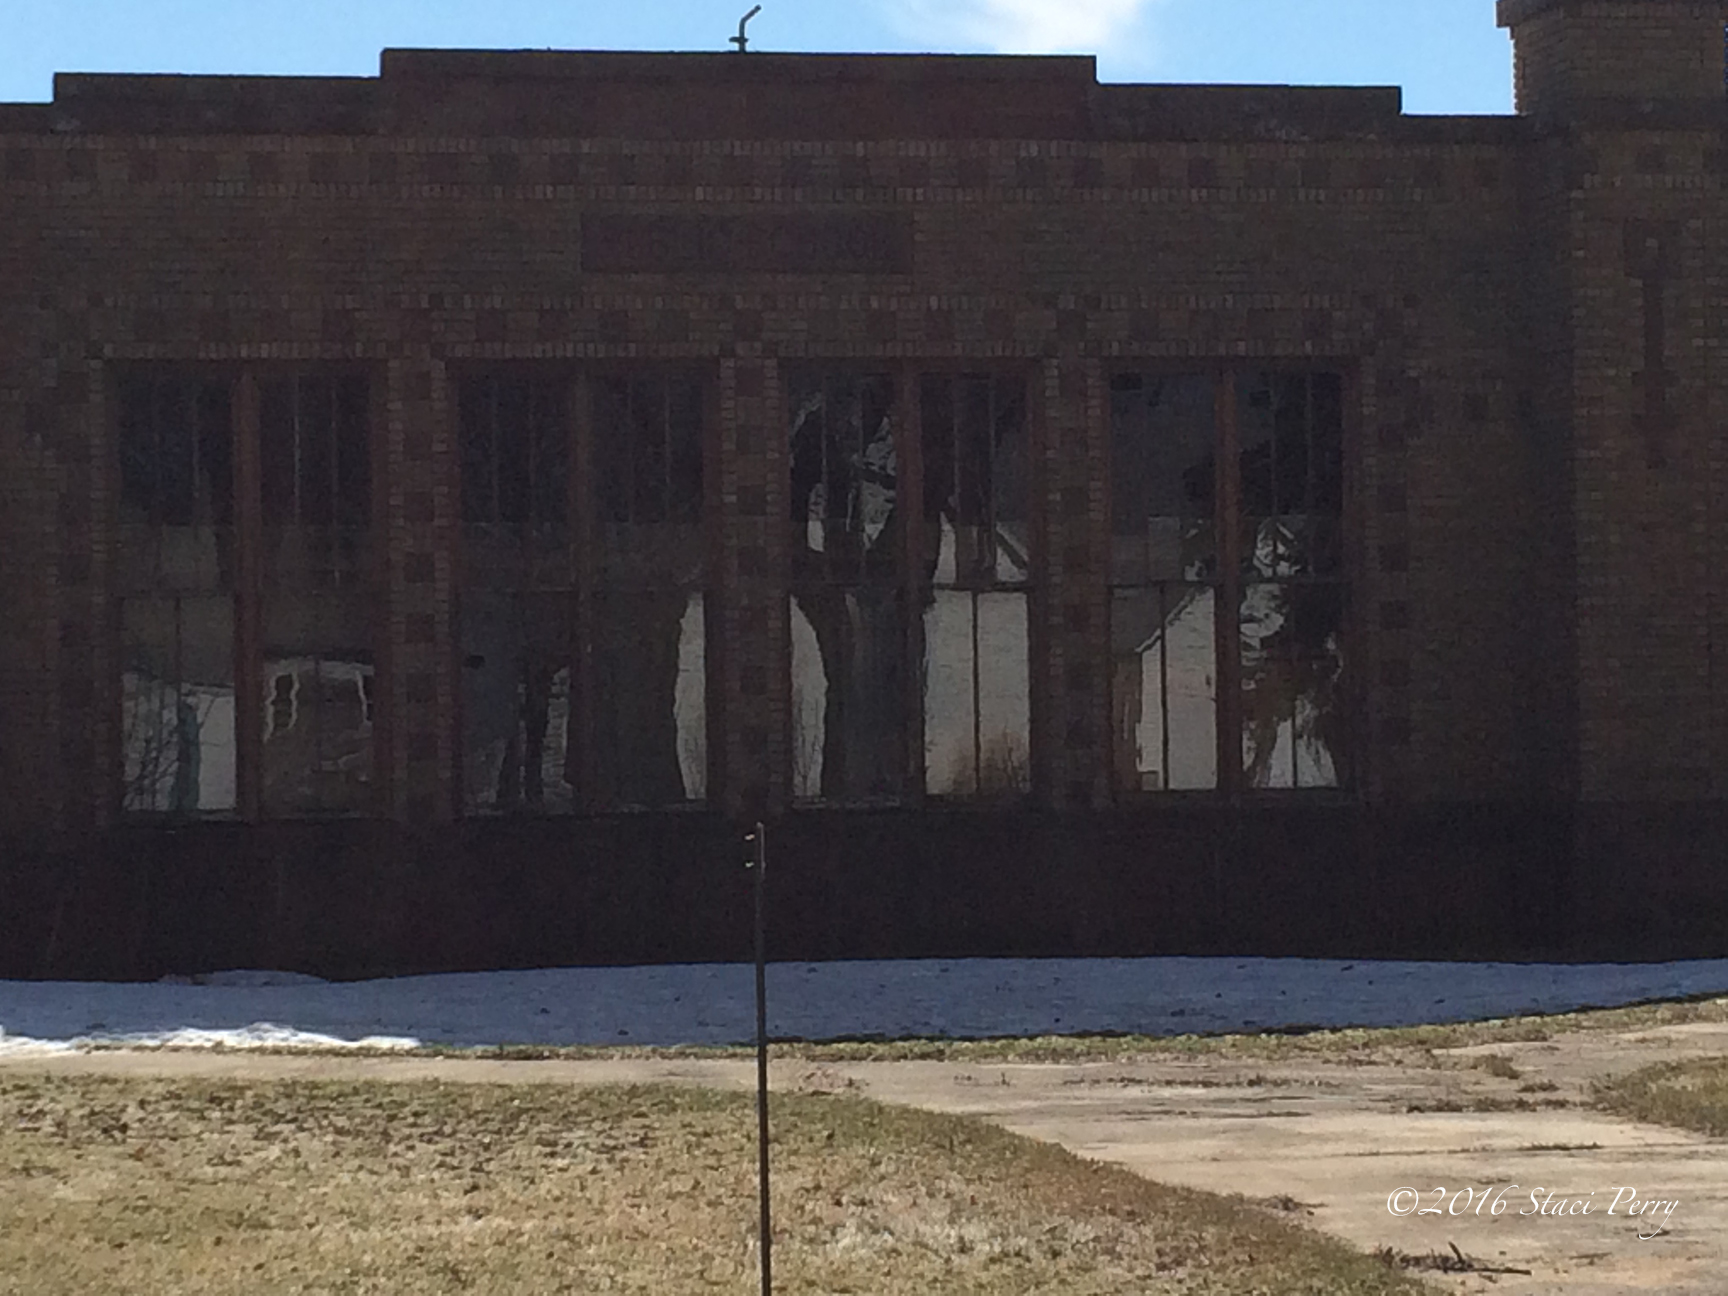 Former Verdi, Minnesota Public School